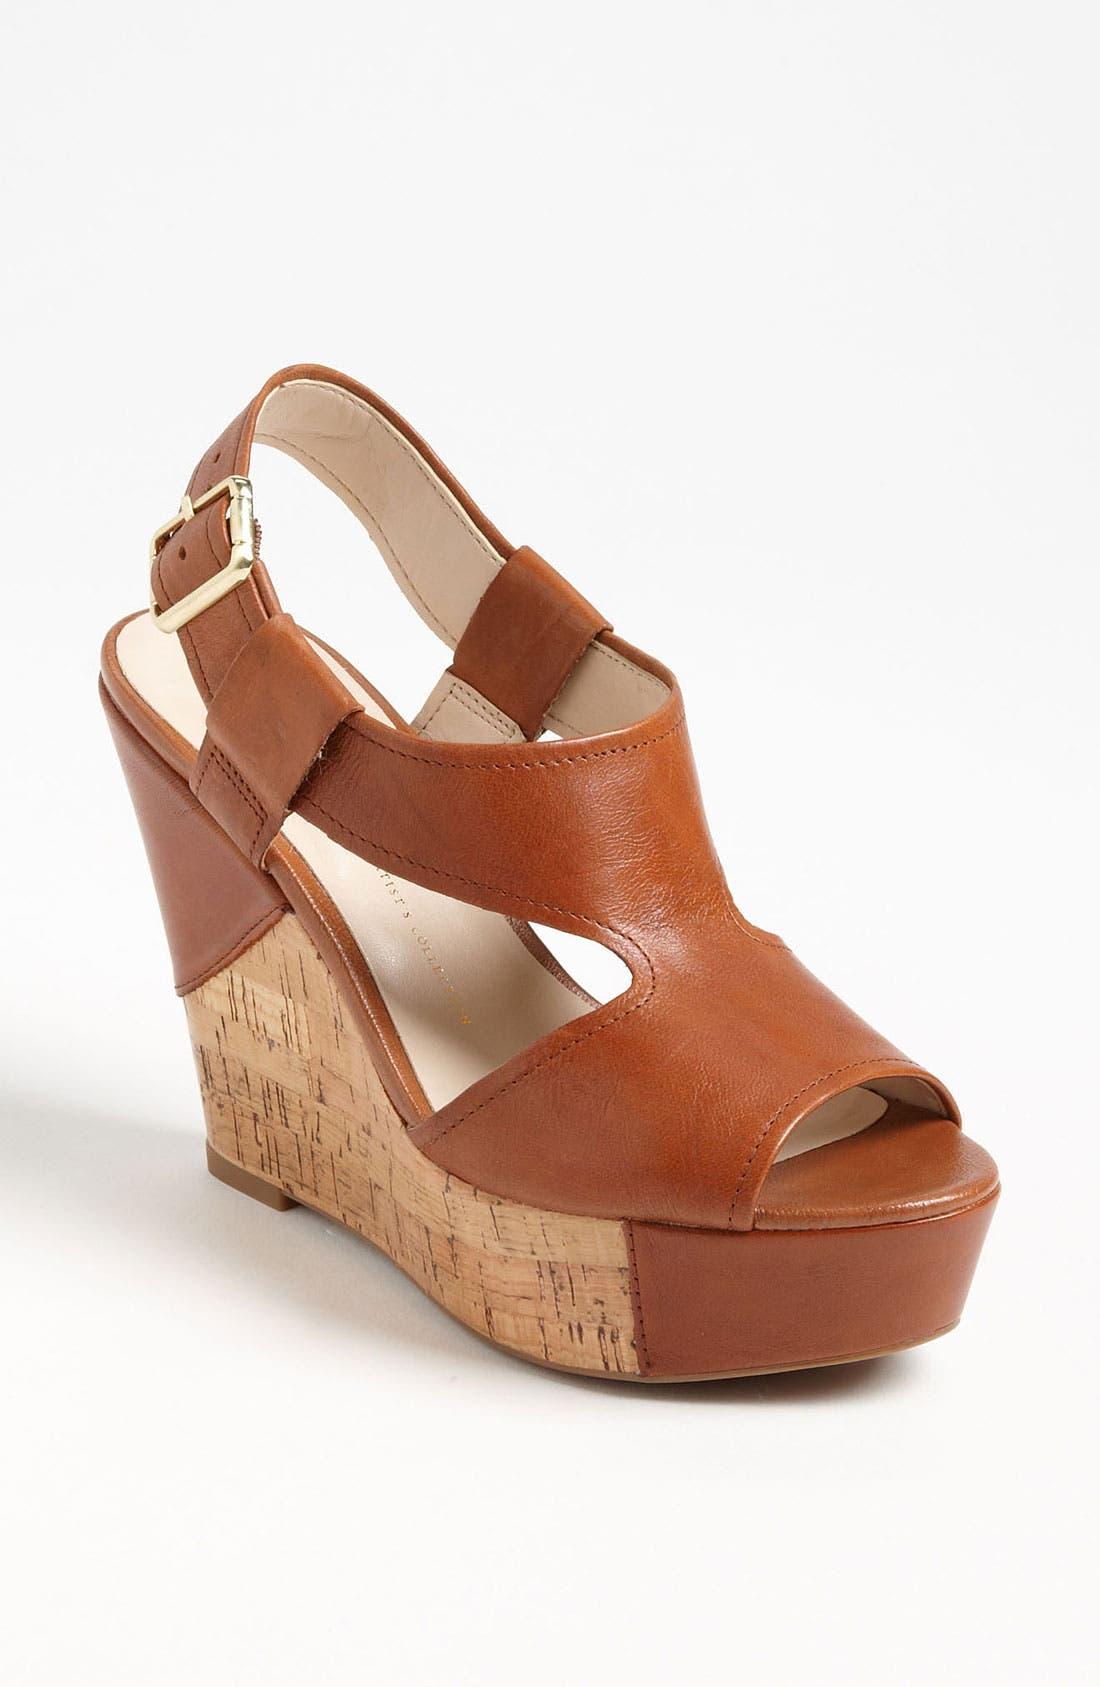 Alternate Image 1 Selected - Franco Sarto 'Xenon' Wedge Sandal (Special Purchase)